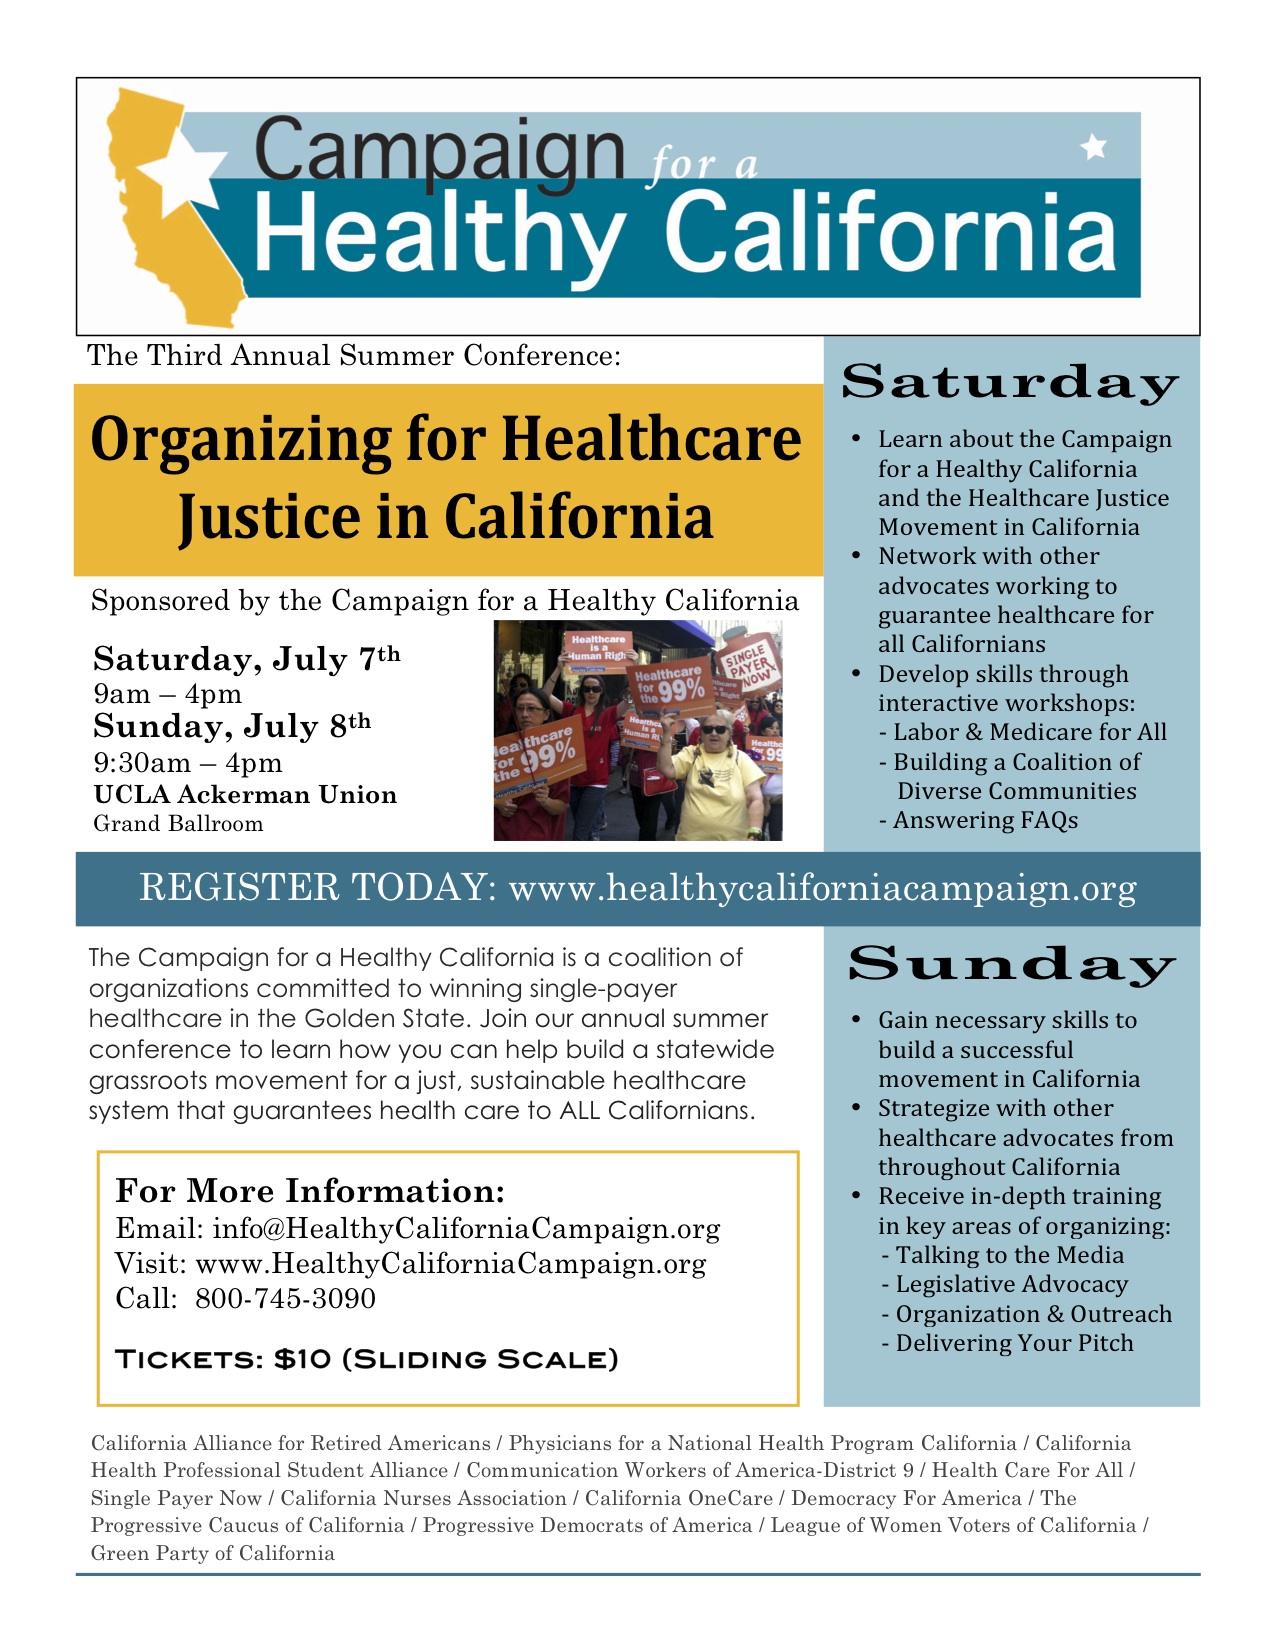 Summer Conference Flyer